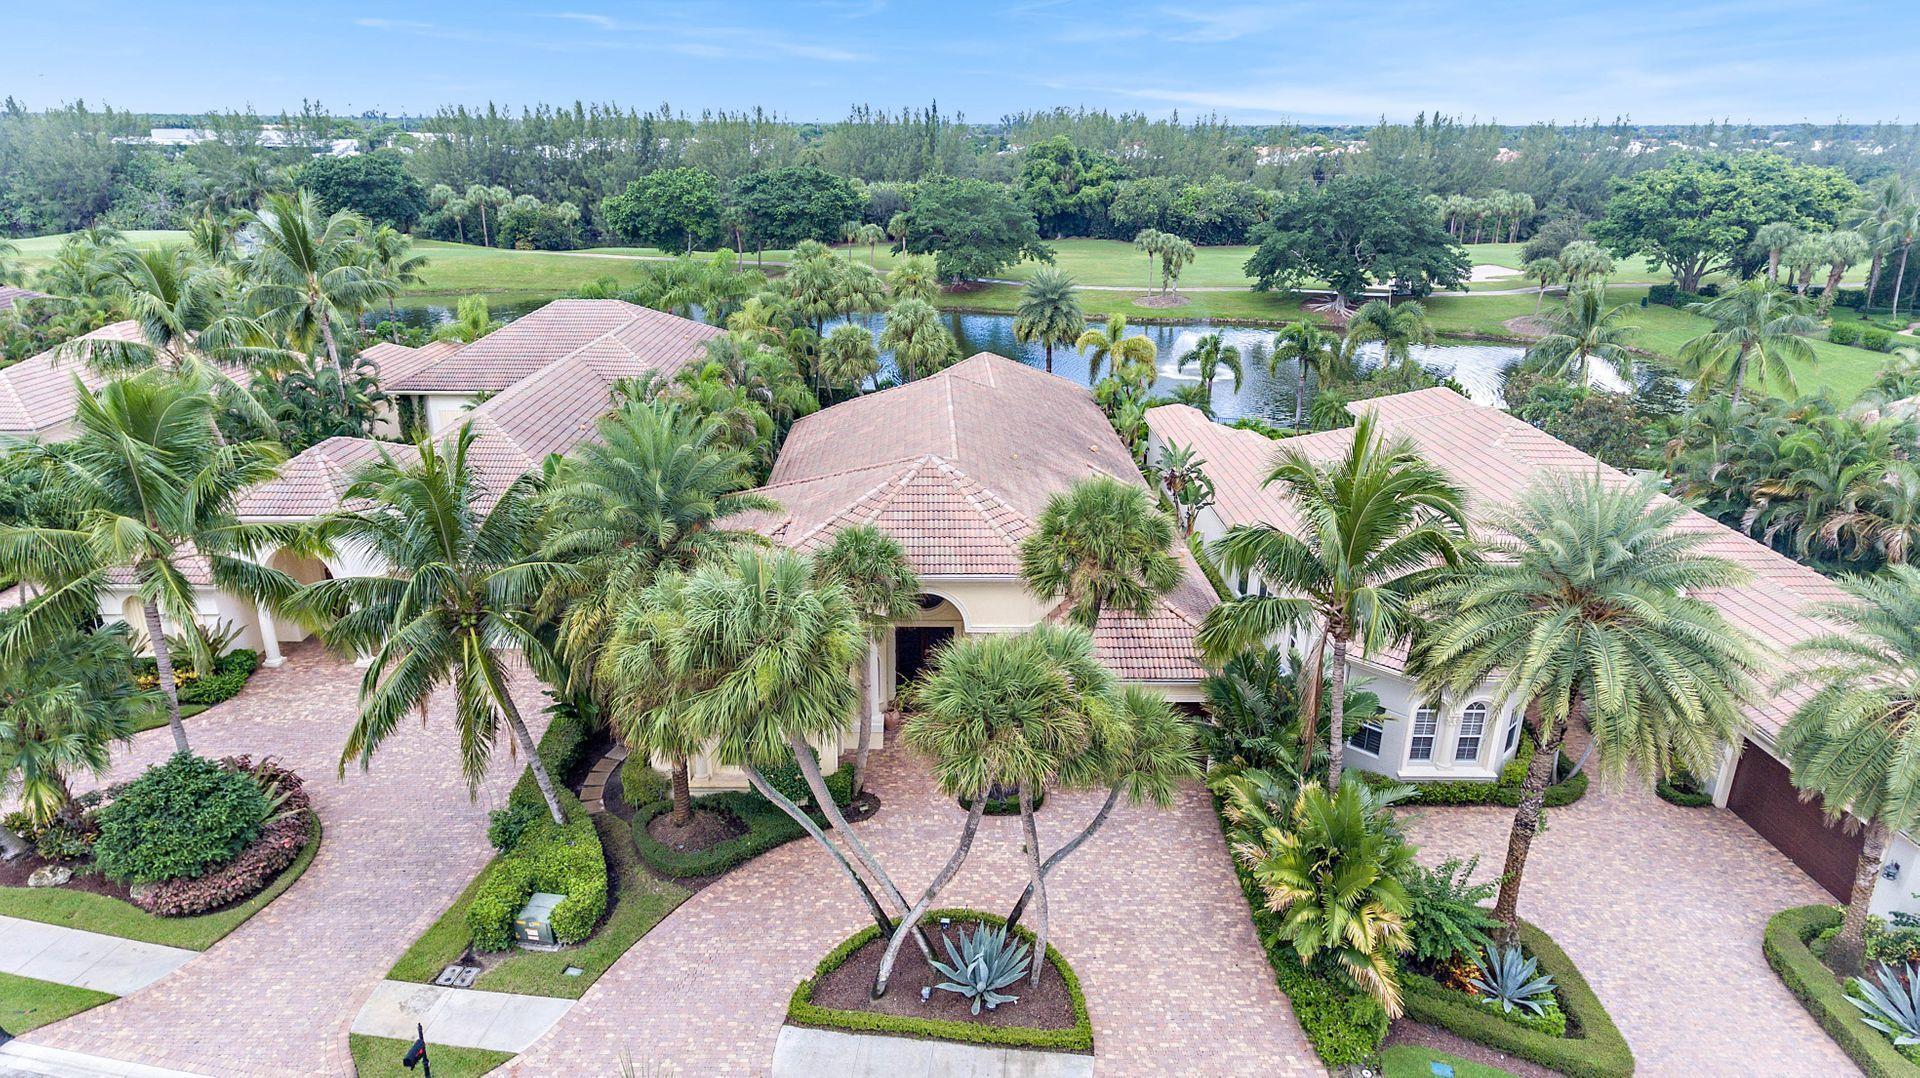 211 Coconut Key Drive, Palm Beach Gardens, Florida 33418, 3 Bedrooms Bedrooms, ,4.1 BathroomsBathrooms,A,Single family,Coconut Key,RX-10465549